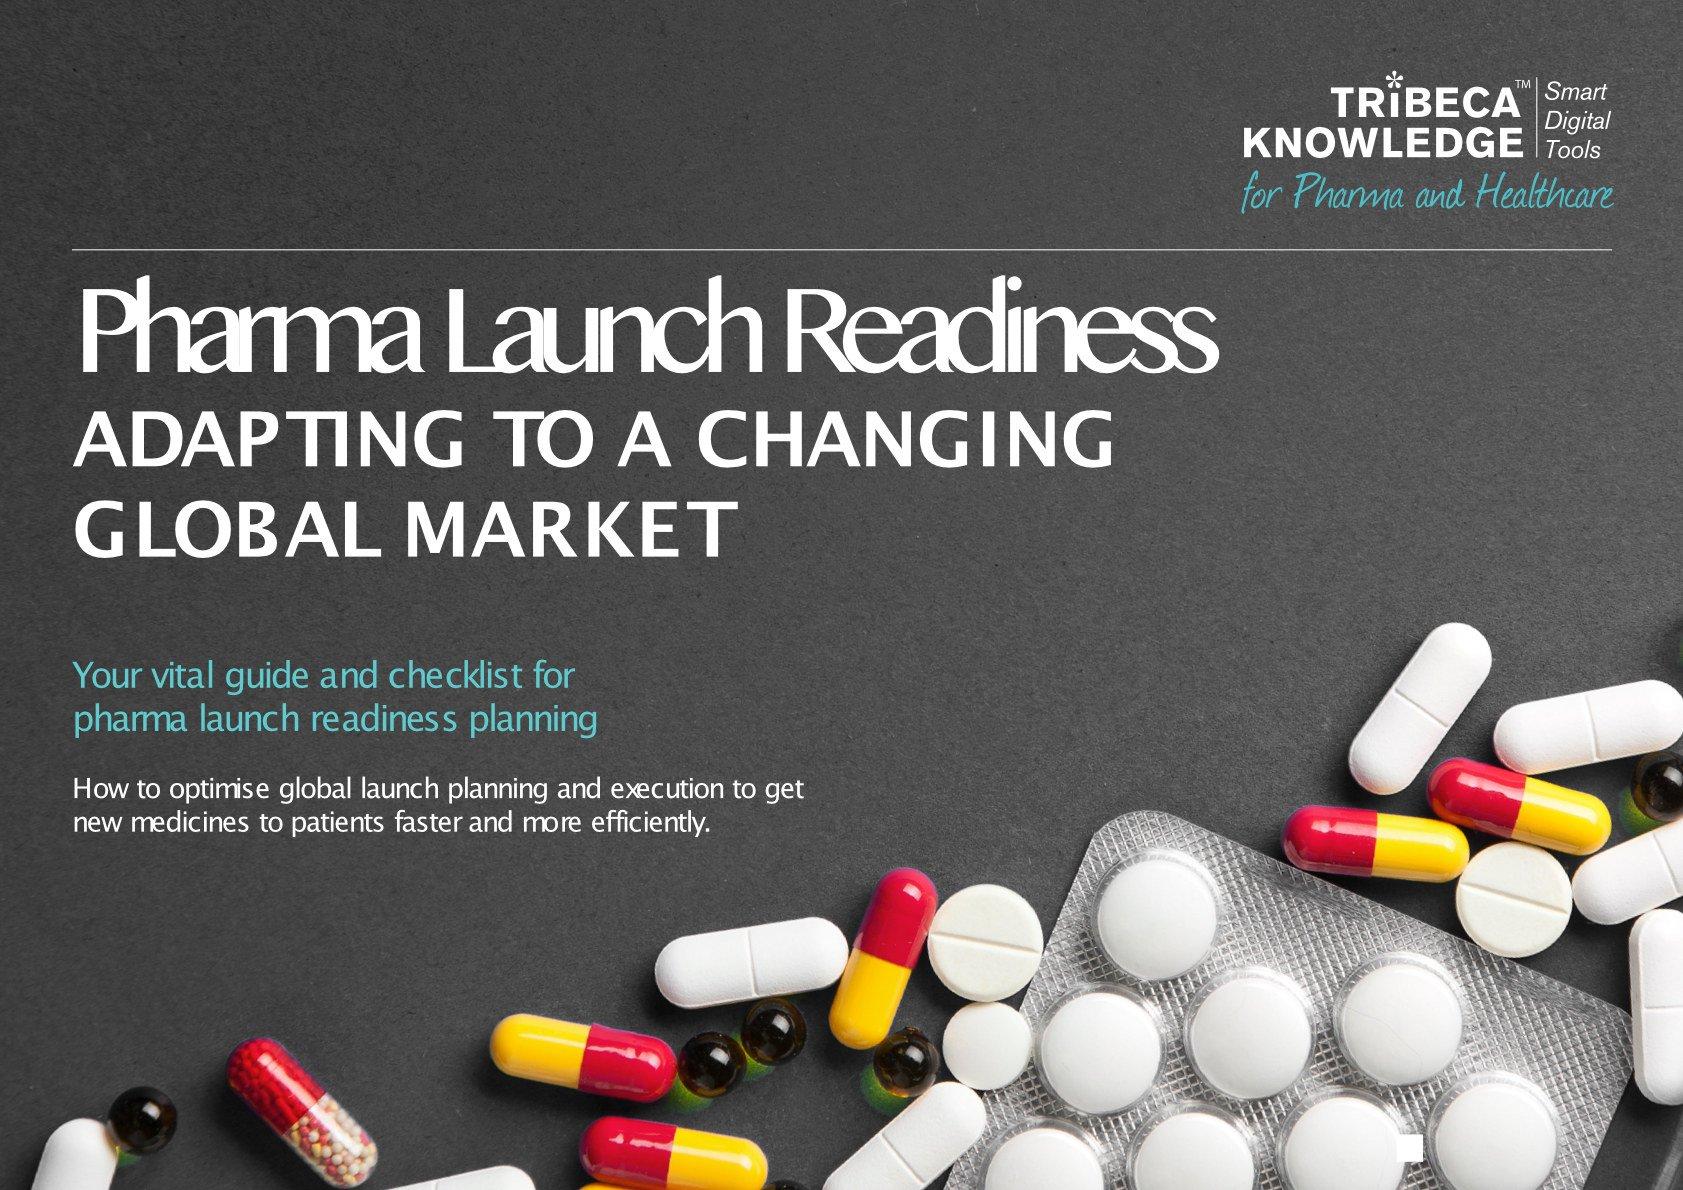 Pharma launch readiness checklist guide.jpg